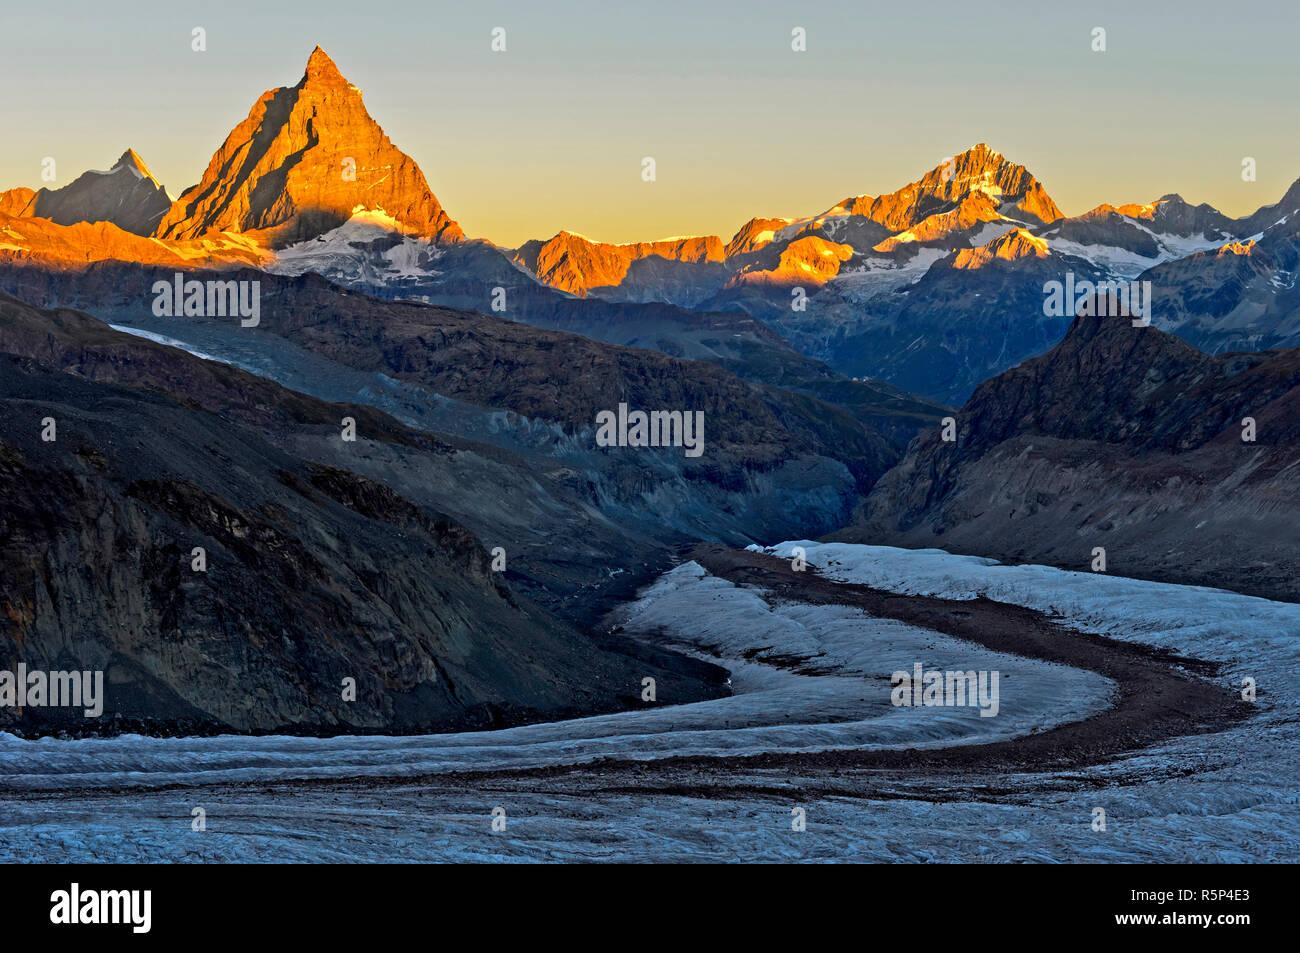 Morning sun at the Matterhorn, Dent d'Herens left, Dent Blanche right, Gorner glacier in front, Zermatt, Valais, Switzerland Stock Photo